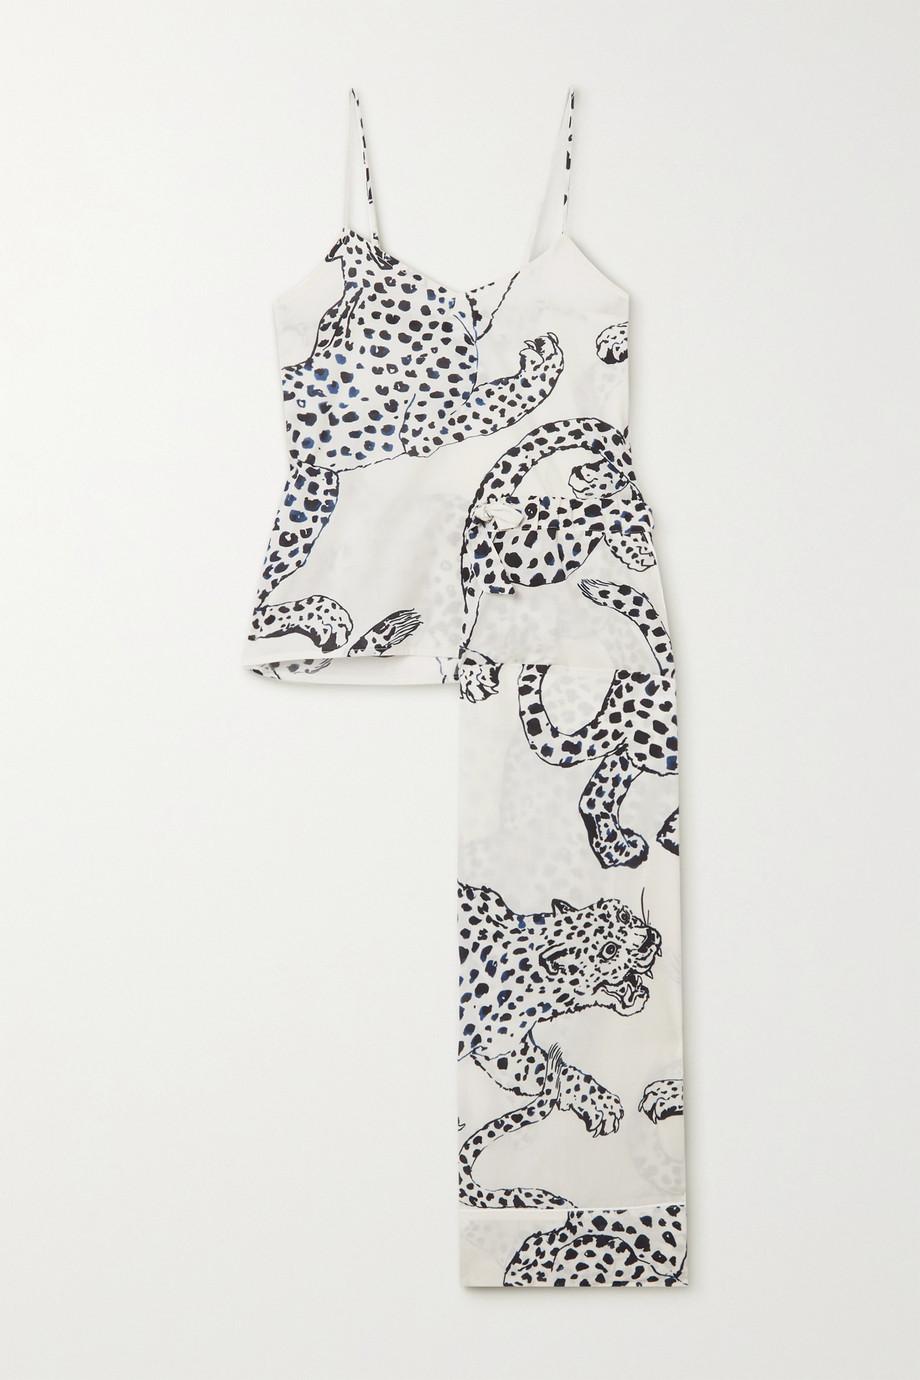 Desmond & Dempsey Jag 印花有机纯棉睡衣套装